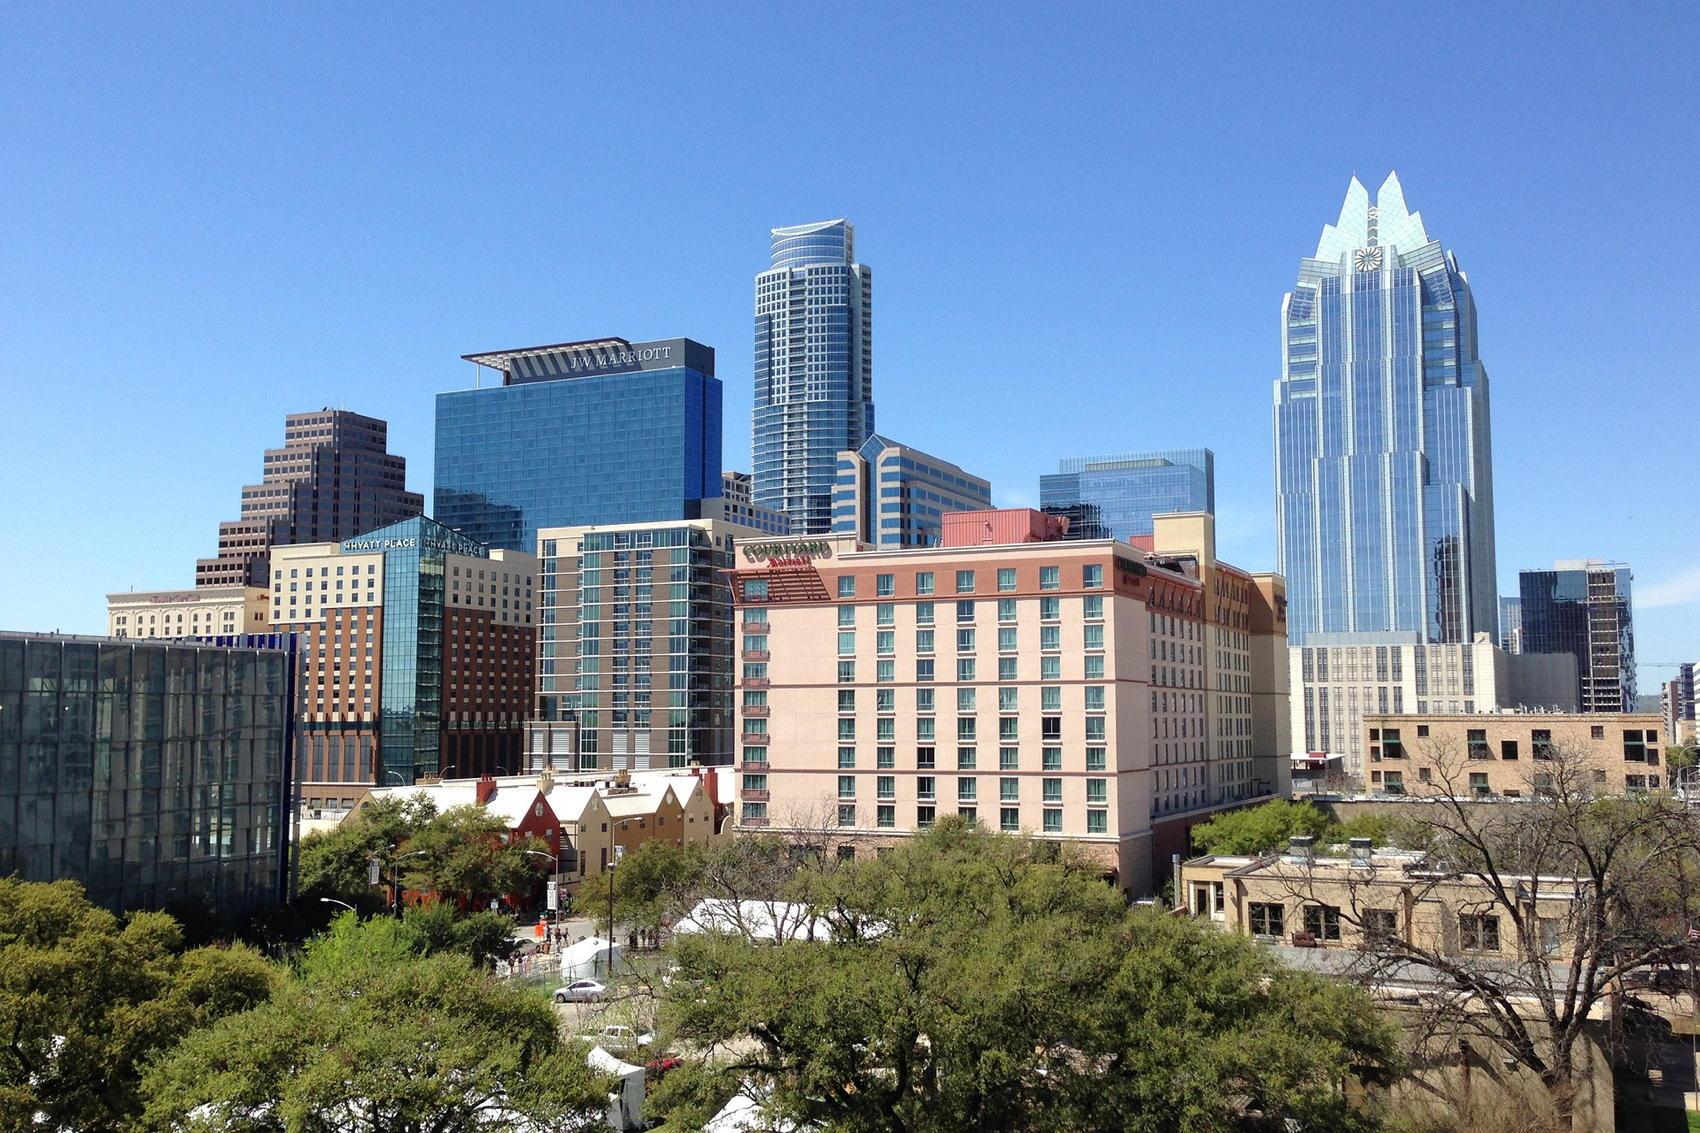 Austin Texas - Image by Kate Baucherel